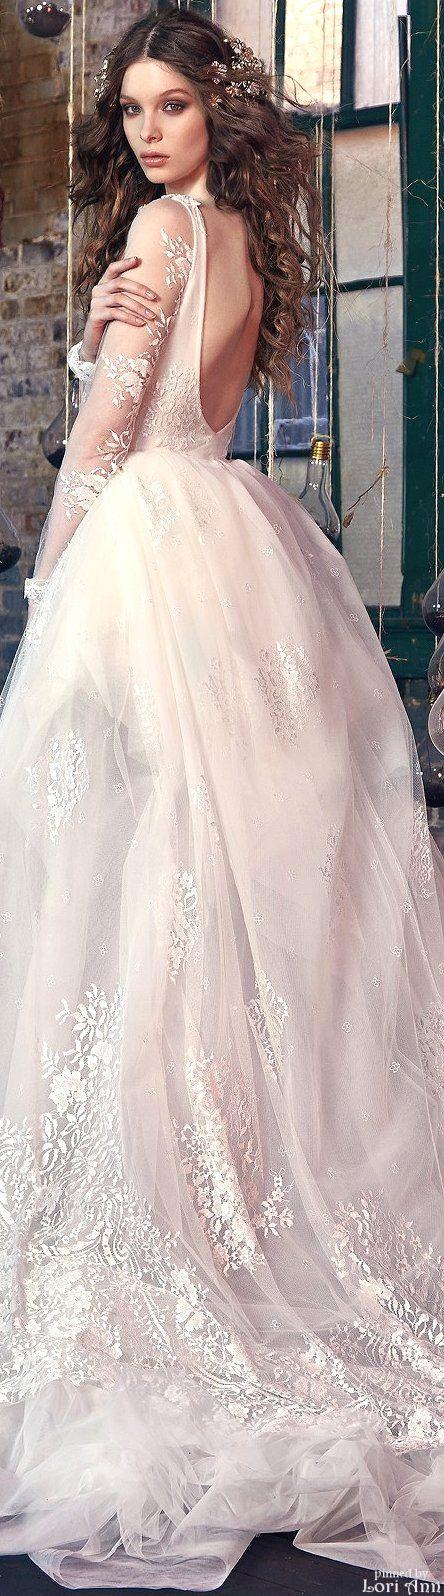 Galia Lahav Bridal – Les Reves Bohemians Collection